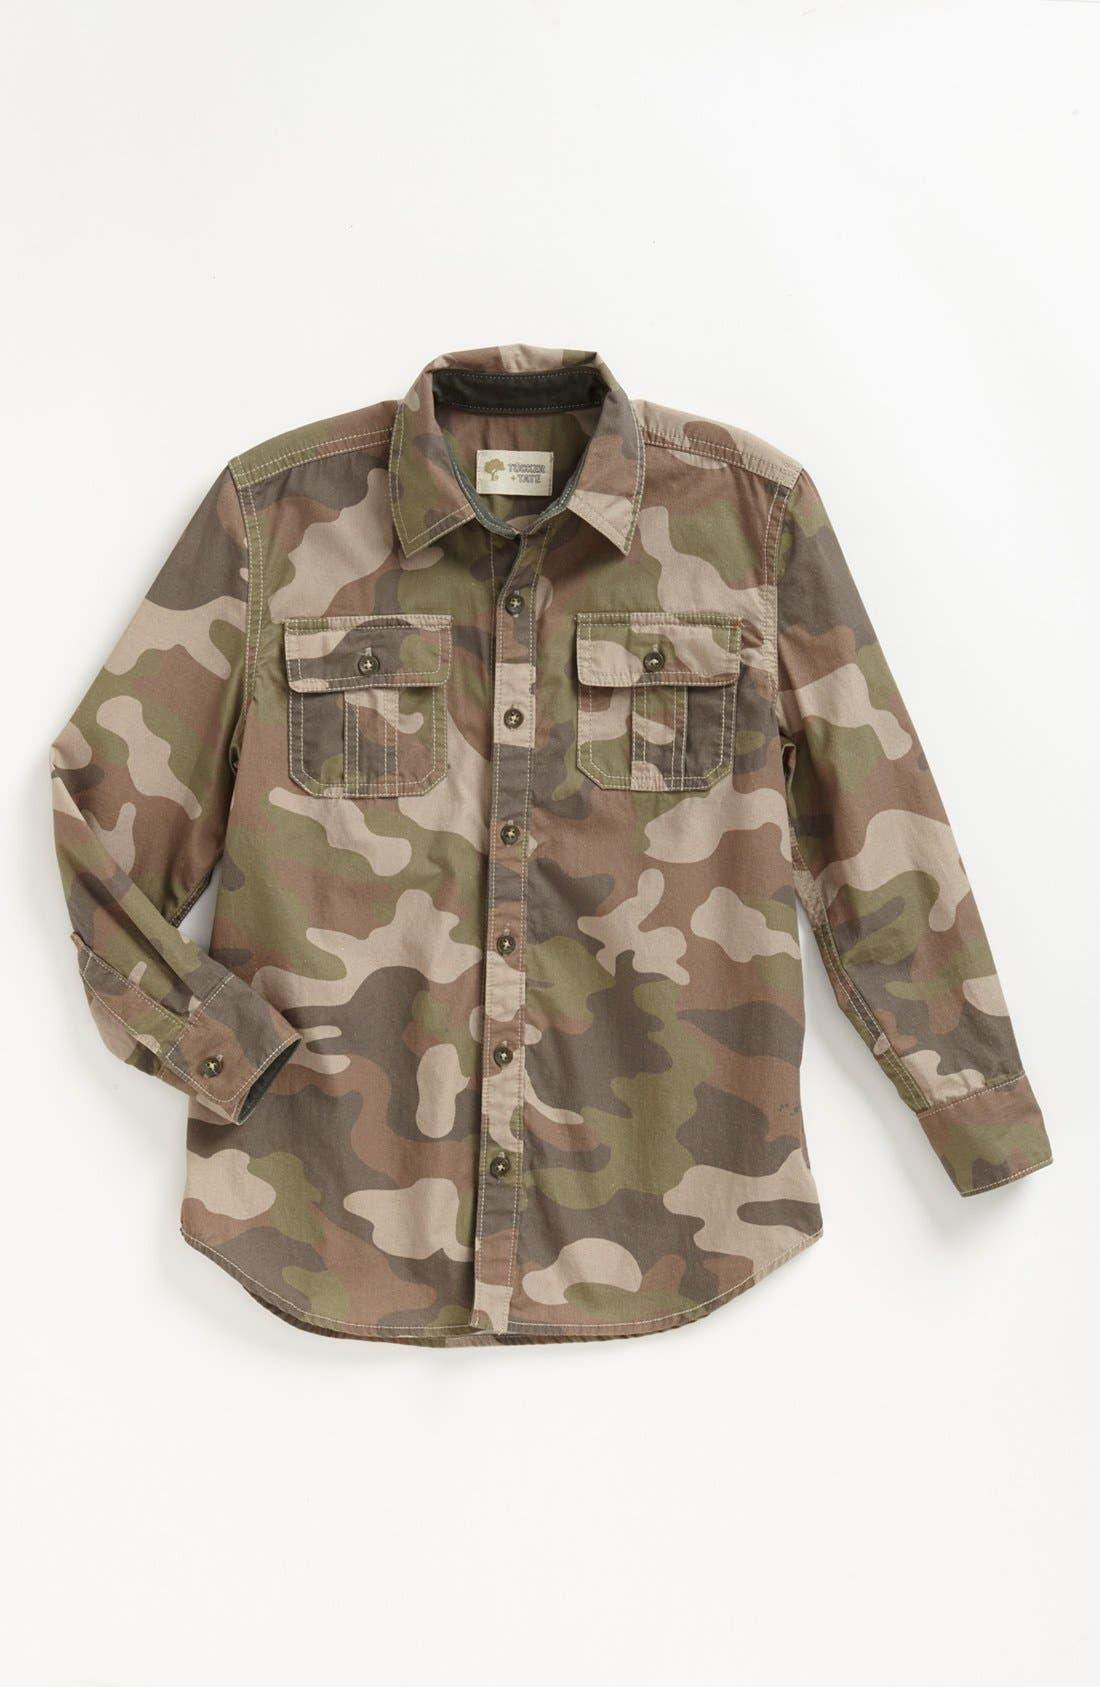 Alternate Image 1 Selected - Tucker + Tate 'Bluewater' Camo Sport Shirt (Little Boy)